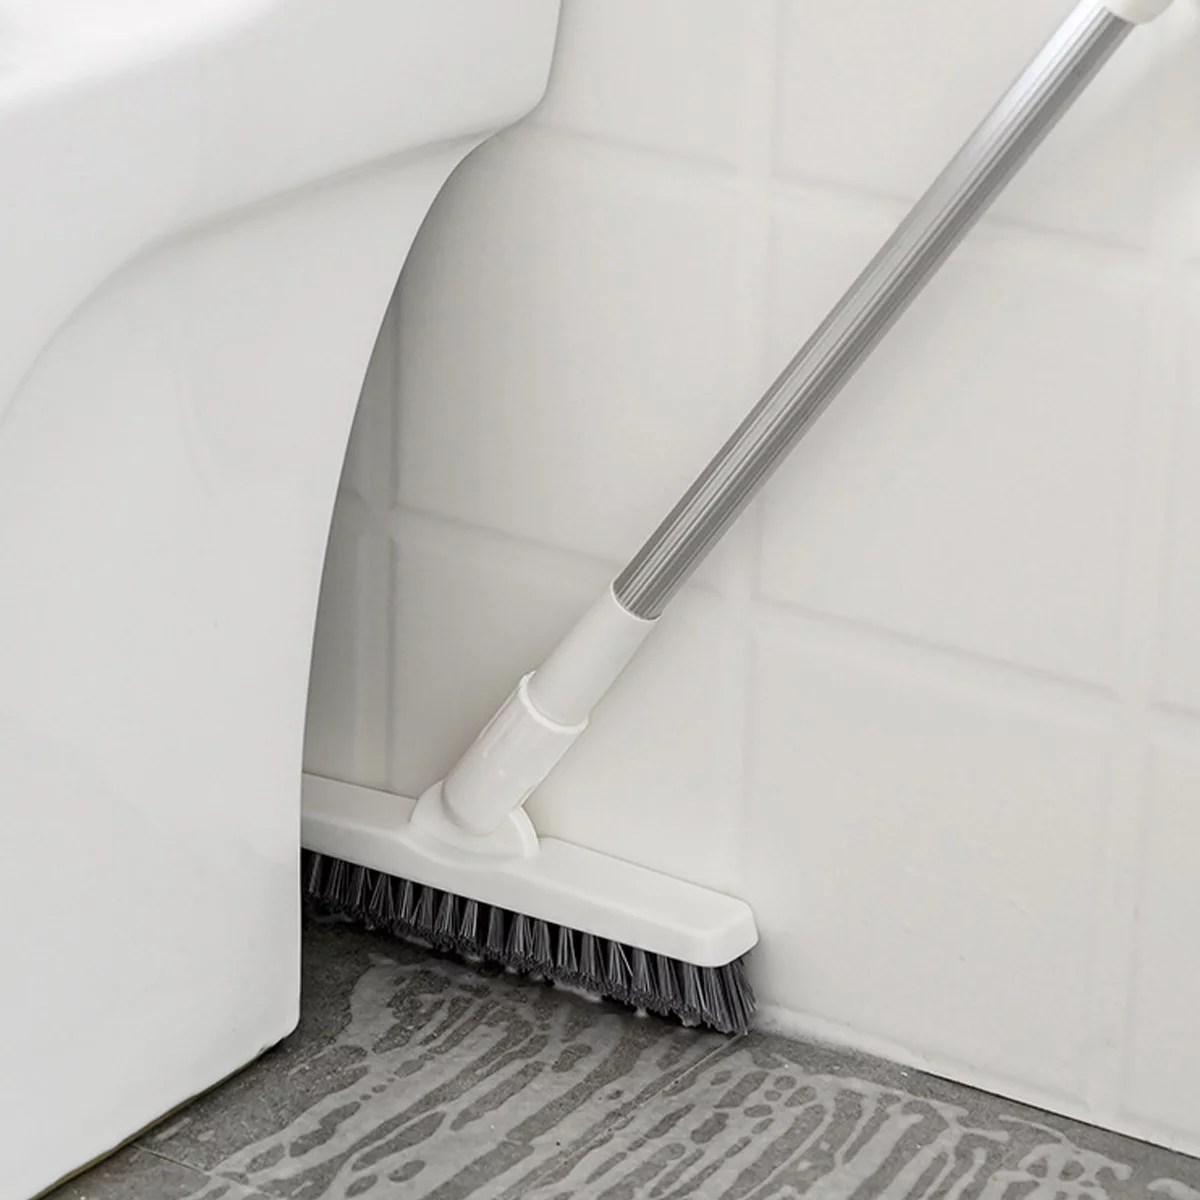 floor scrub brush telescopic tile scrubber corner crevice cleaning brush extendable floor brush kitchen bathroom cleaning tool 31 51 adjustable